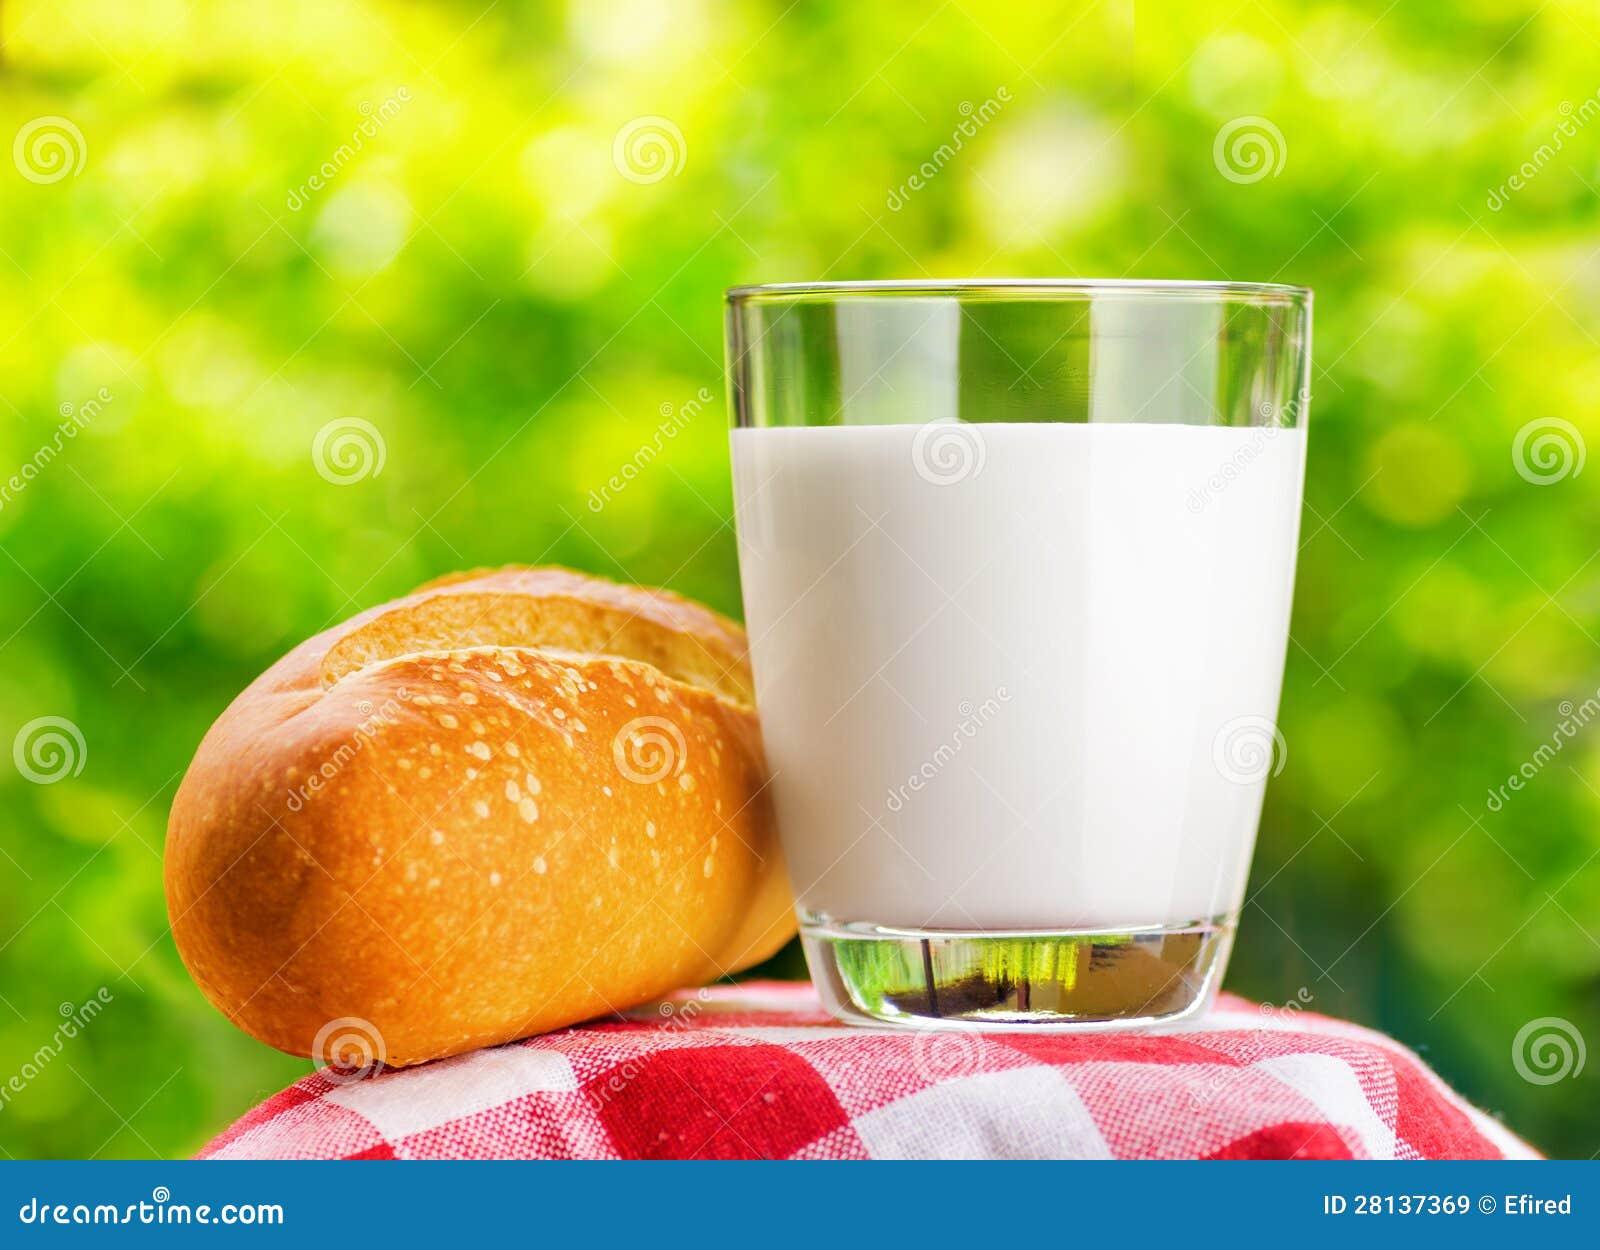 Meadow Meal - Eat